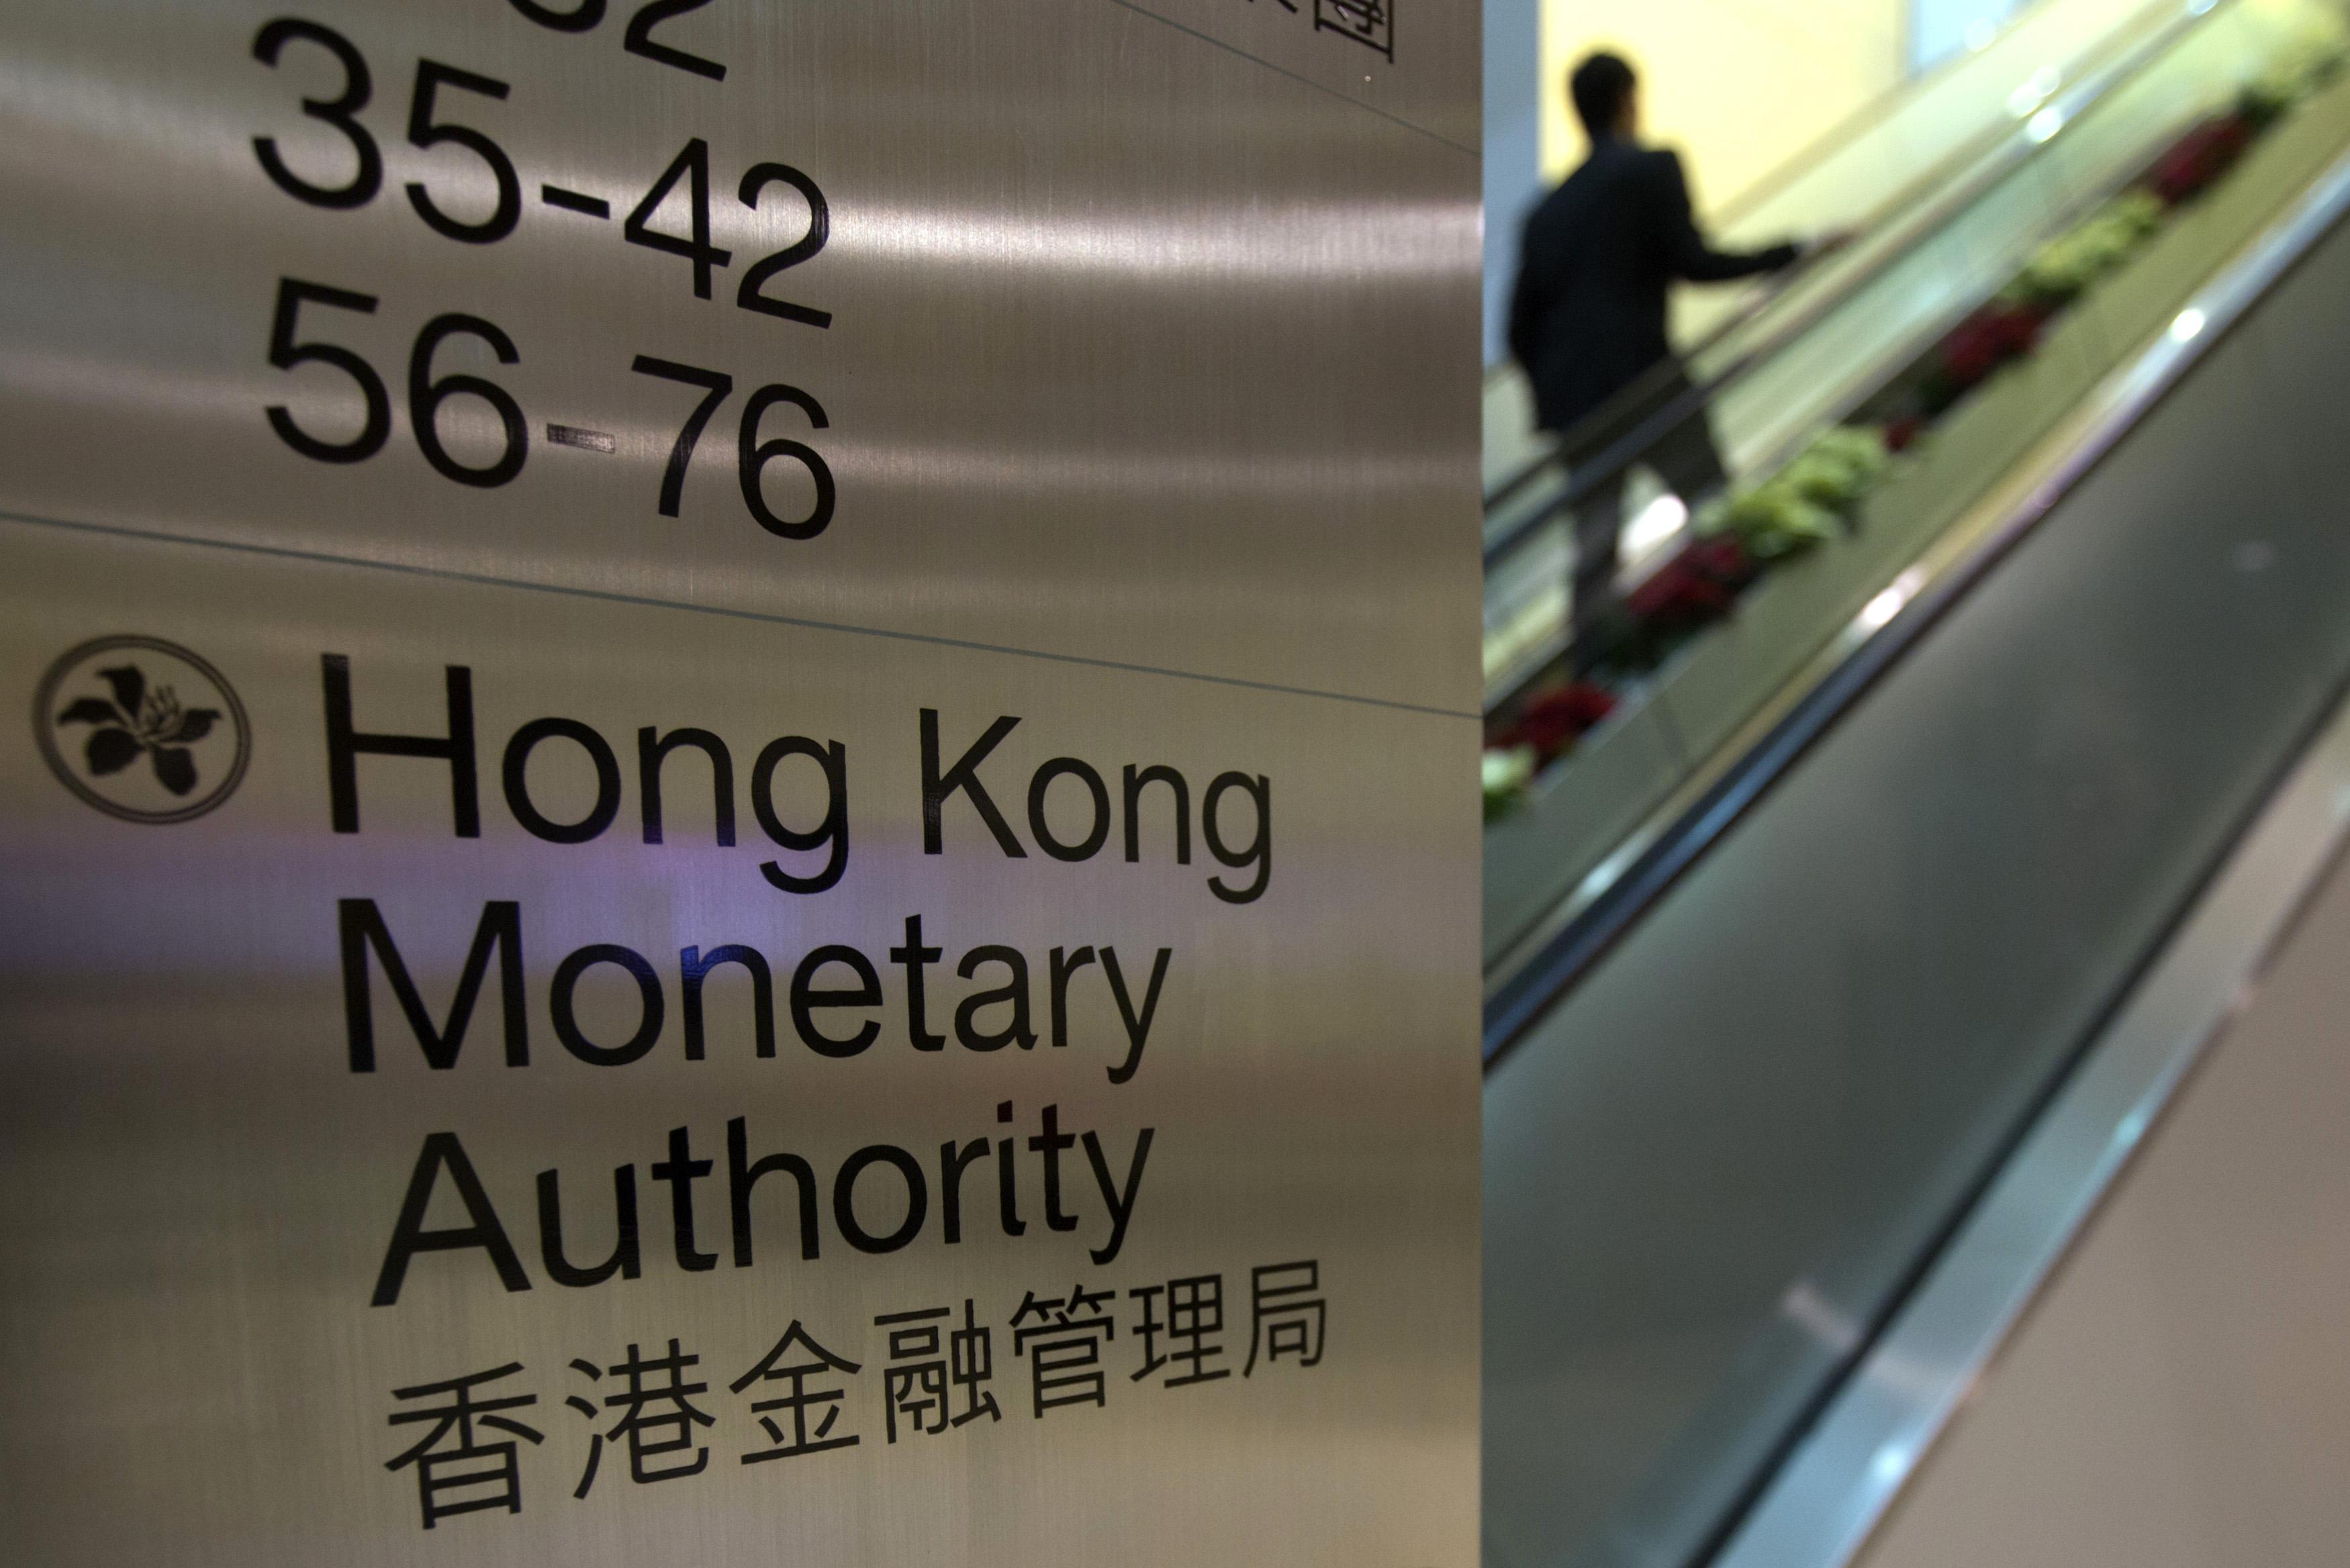 Hong Kong has effective anti-money laundering supervision: regulator